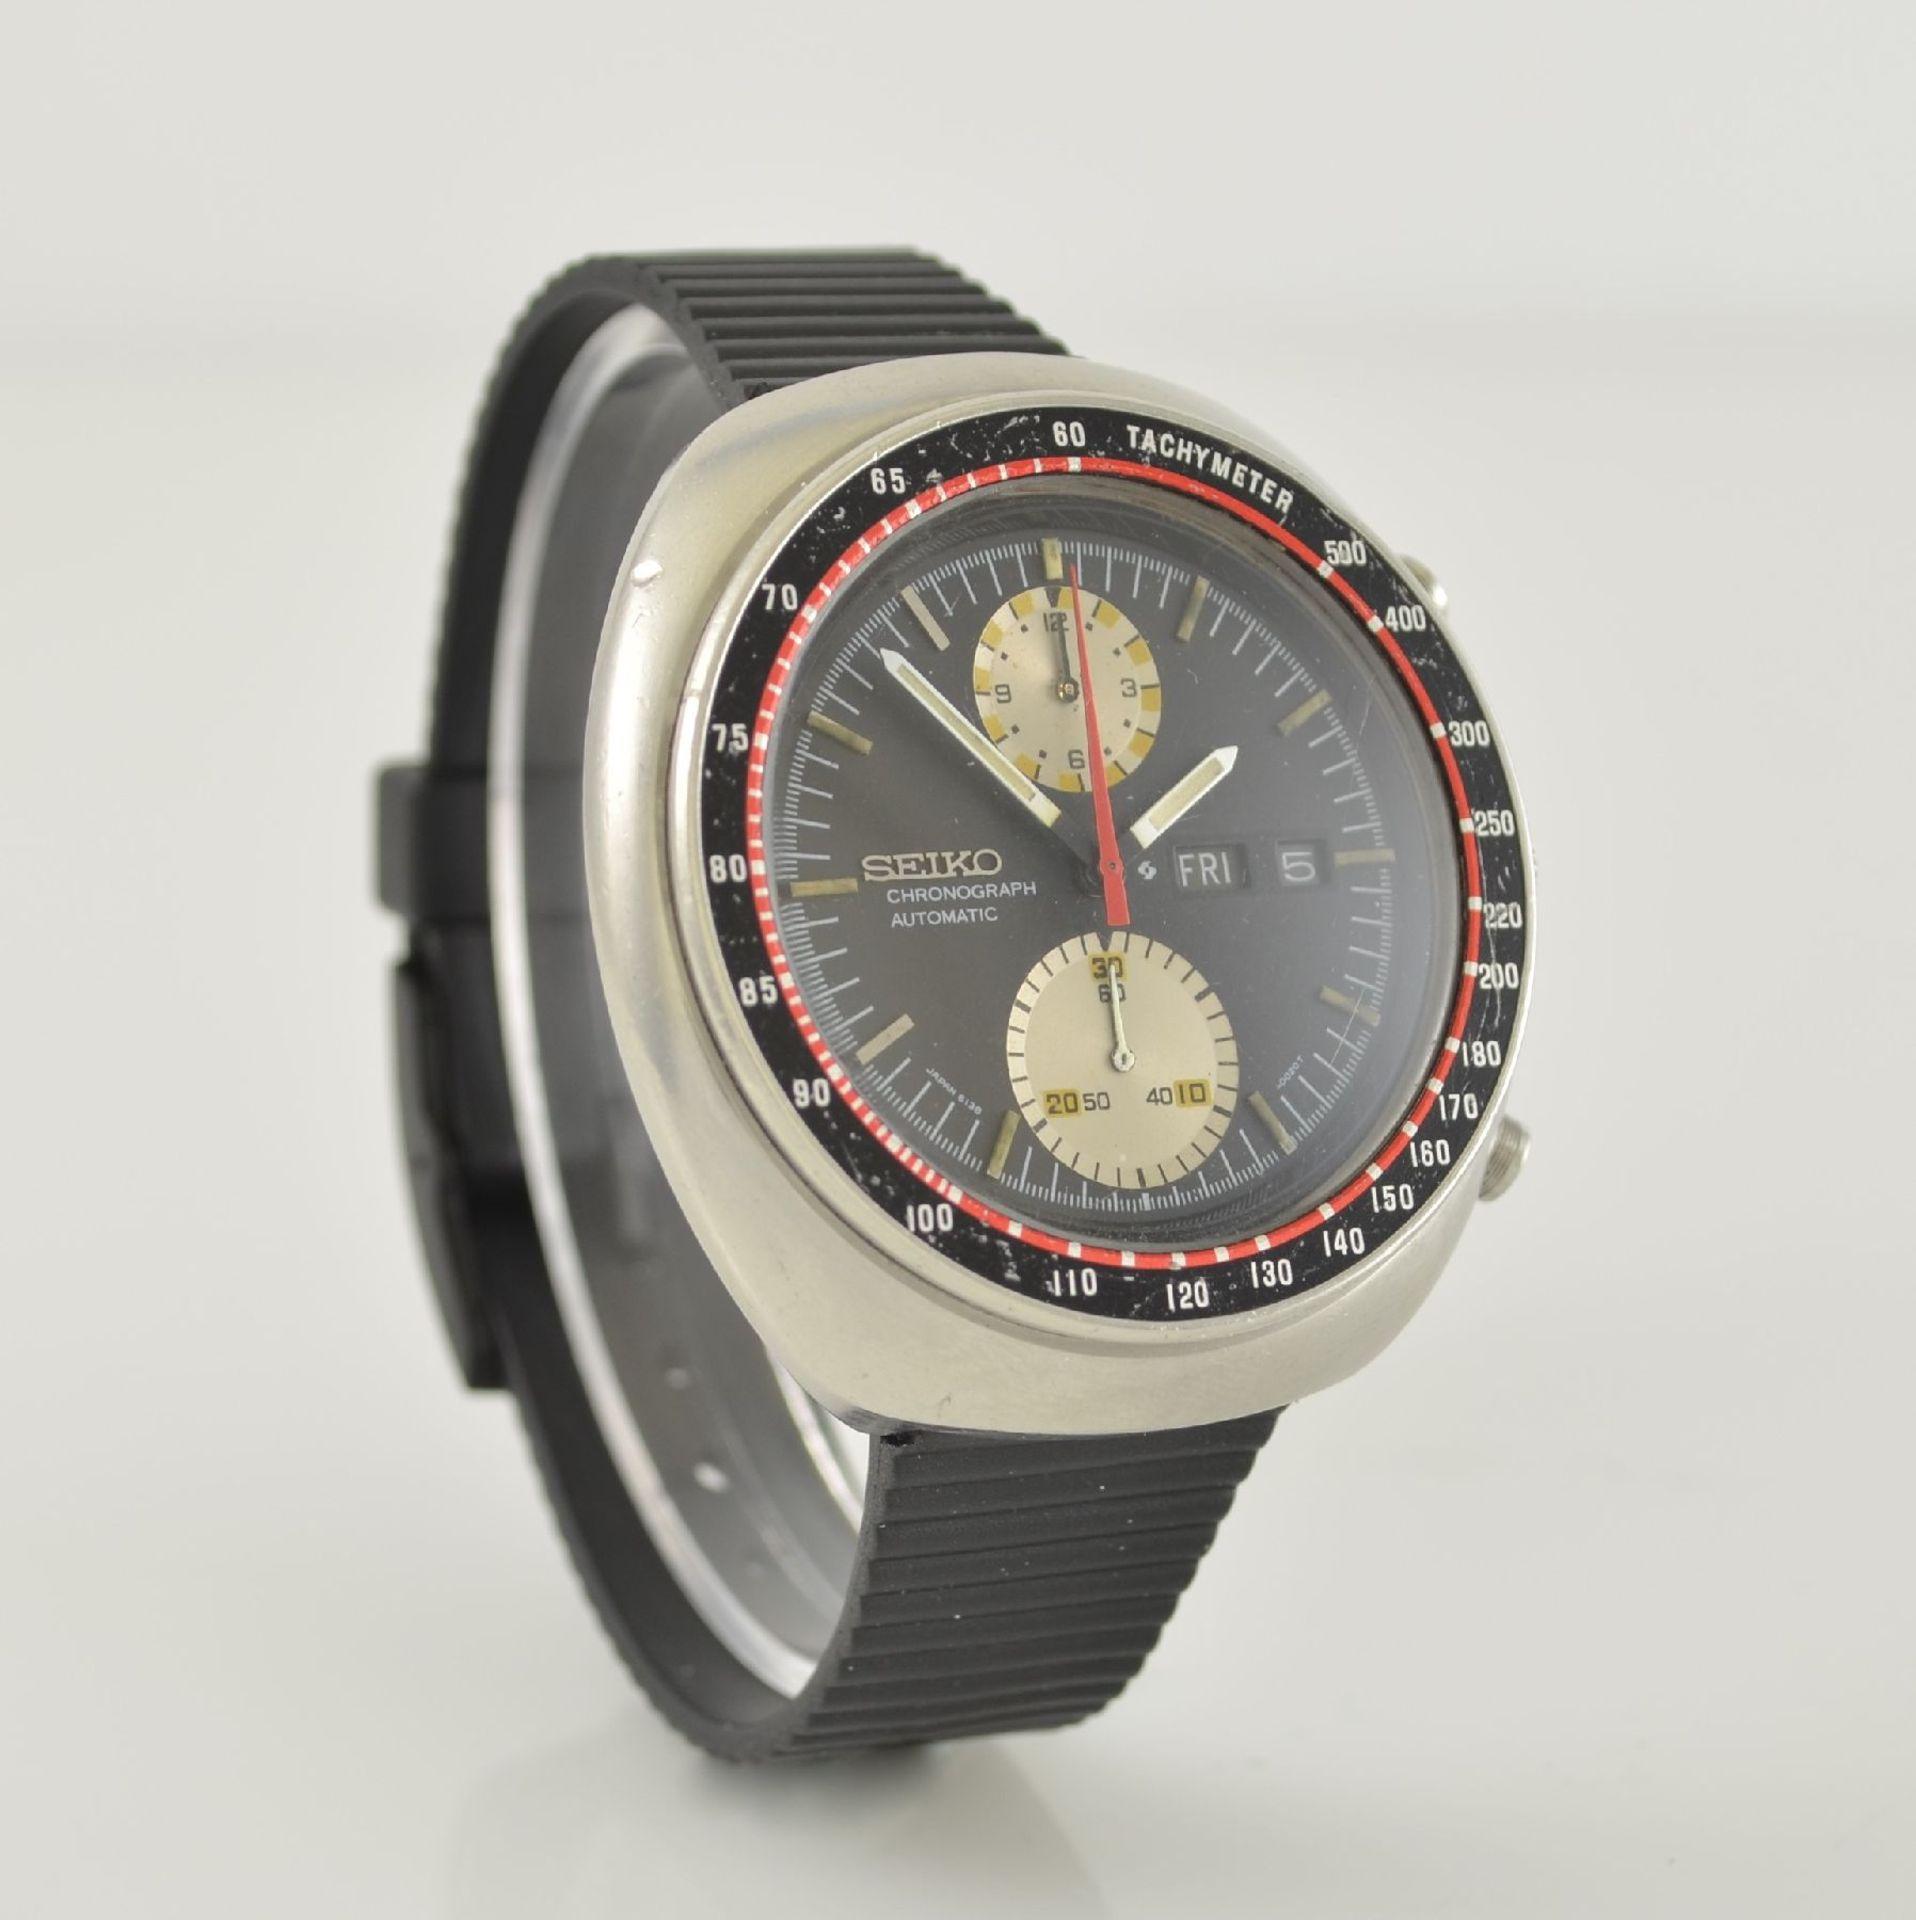 SEIKO Herrenarmbanduhr mit Chronograph, Japan um 1970, Automatik, massives Edelstahlgeh., neutr. - Bild 4 aus 6